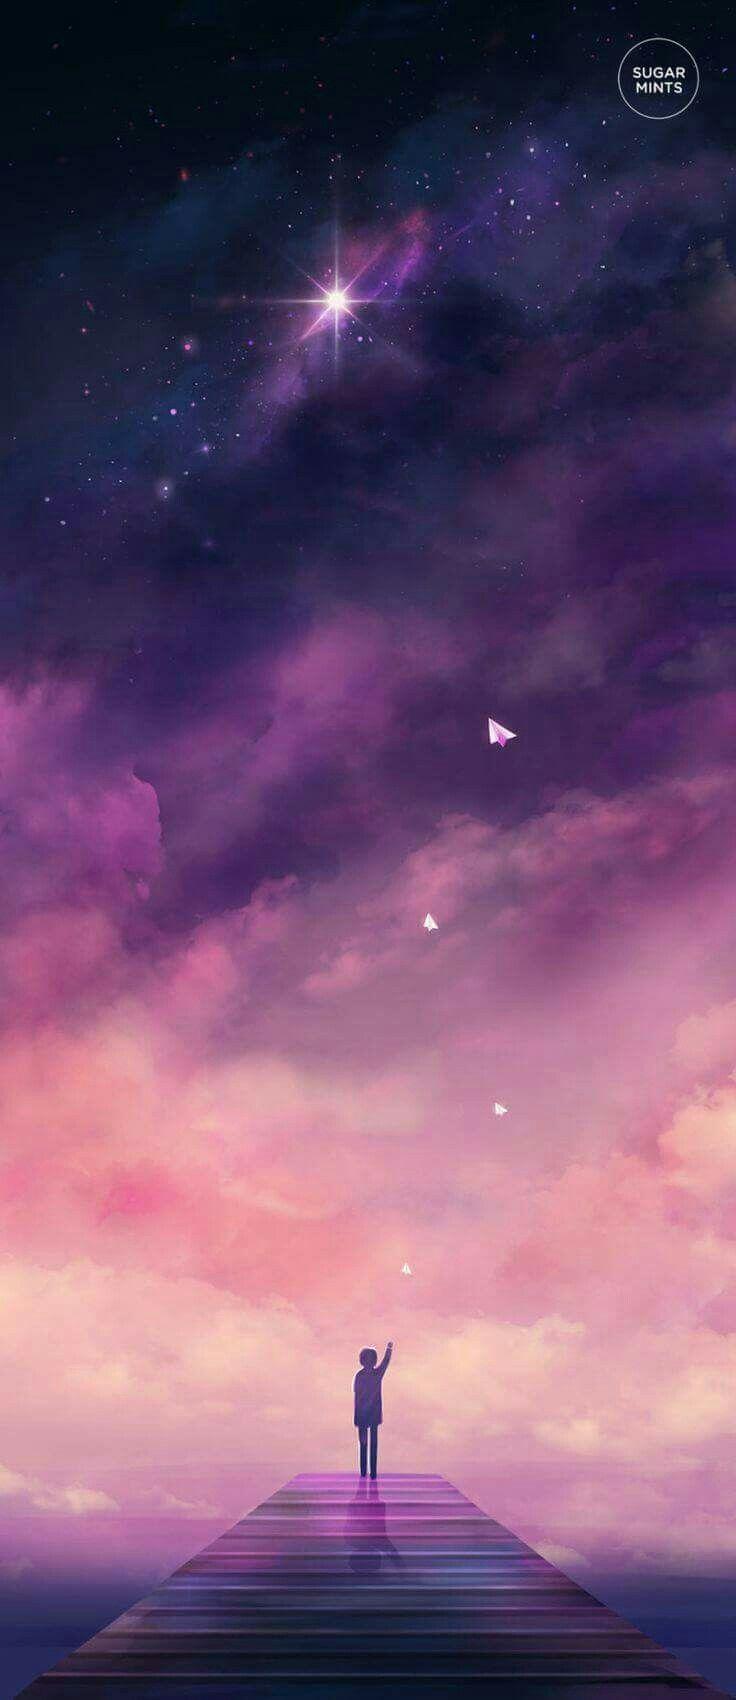 Pin By Juliana Moncada Sanchez On Stars Anime Wallpaper Galaxy Wallpaper Falling In Reverse